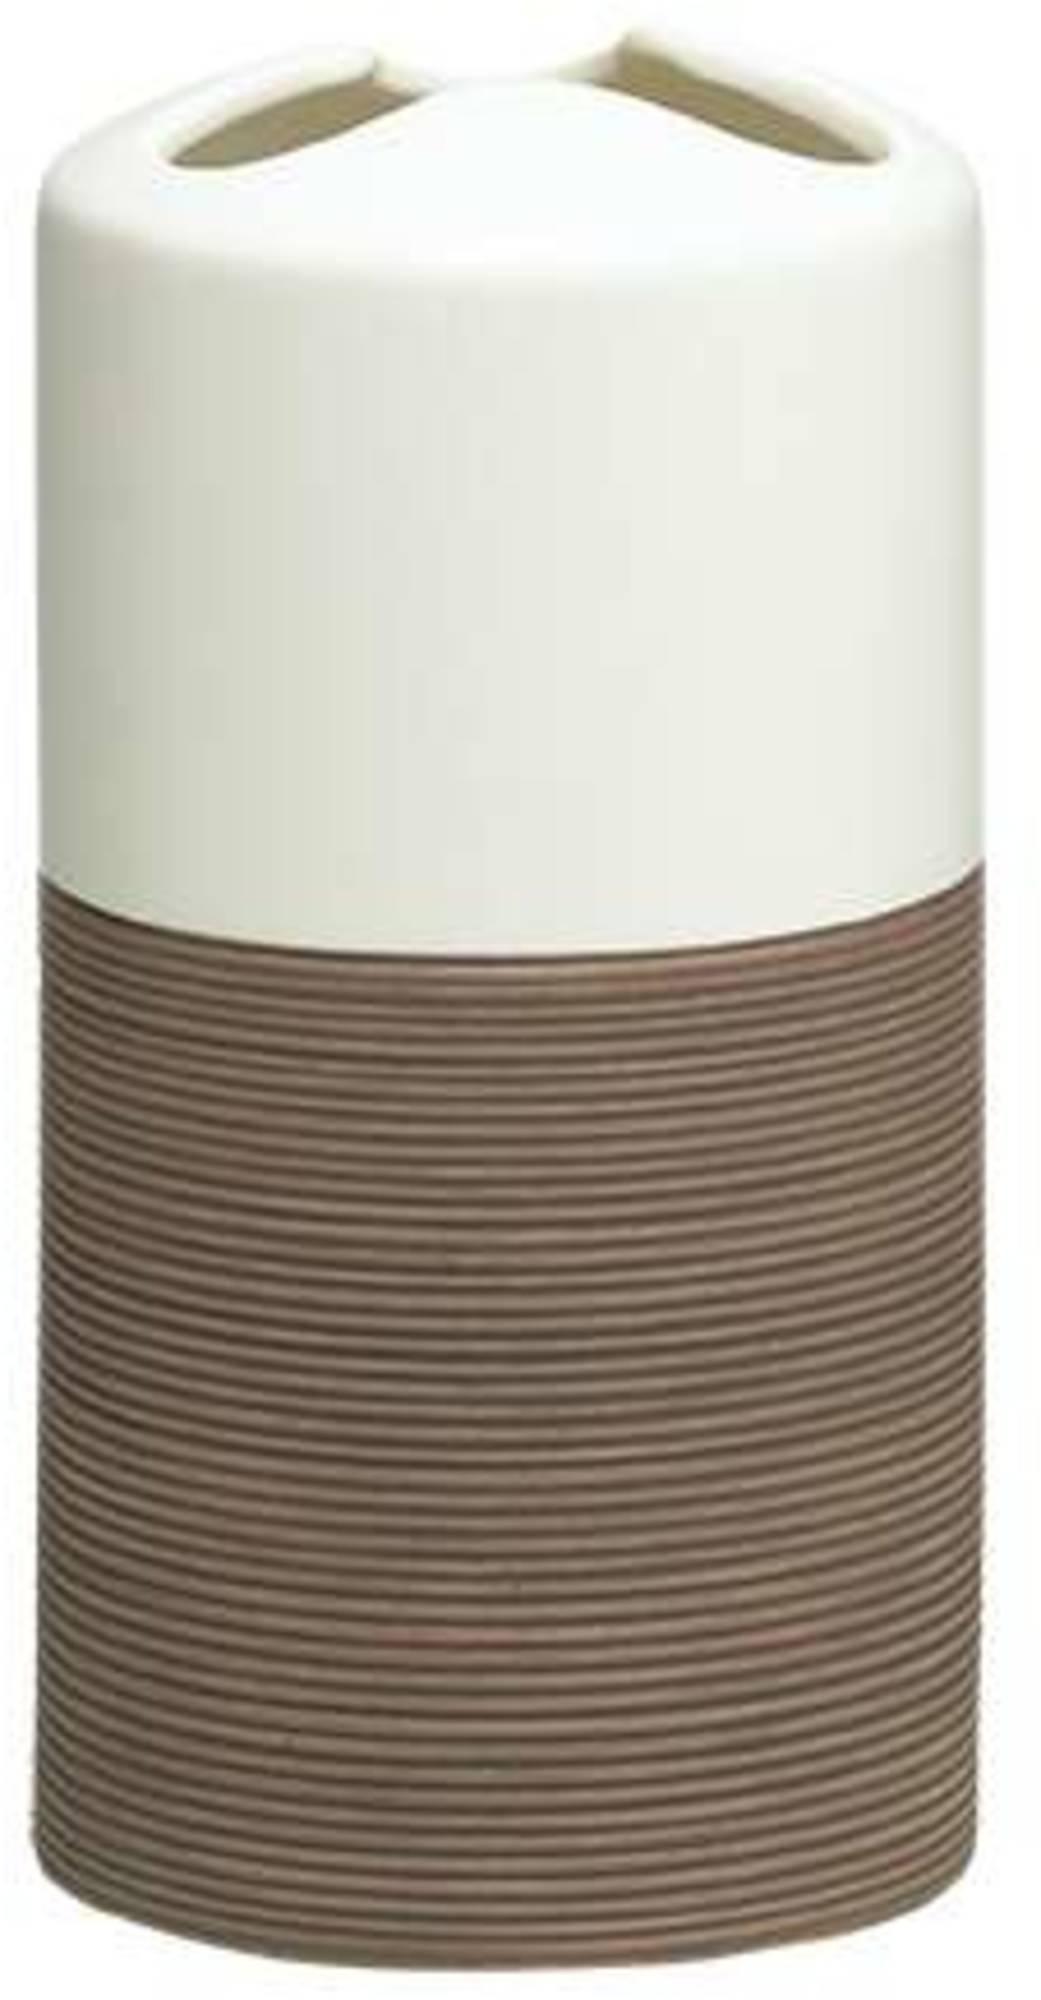 Sealskin Doppio tandenborstelhouder 7x14cm porselein bruin